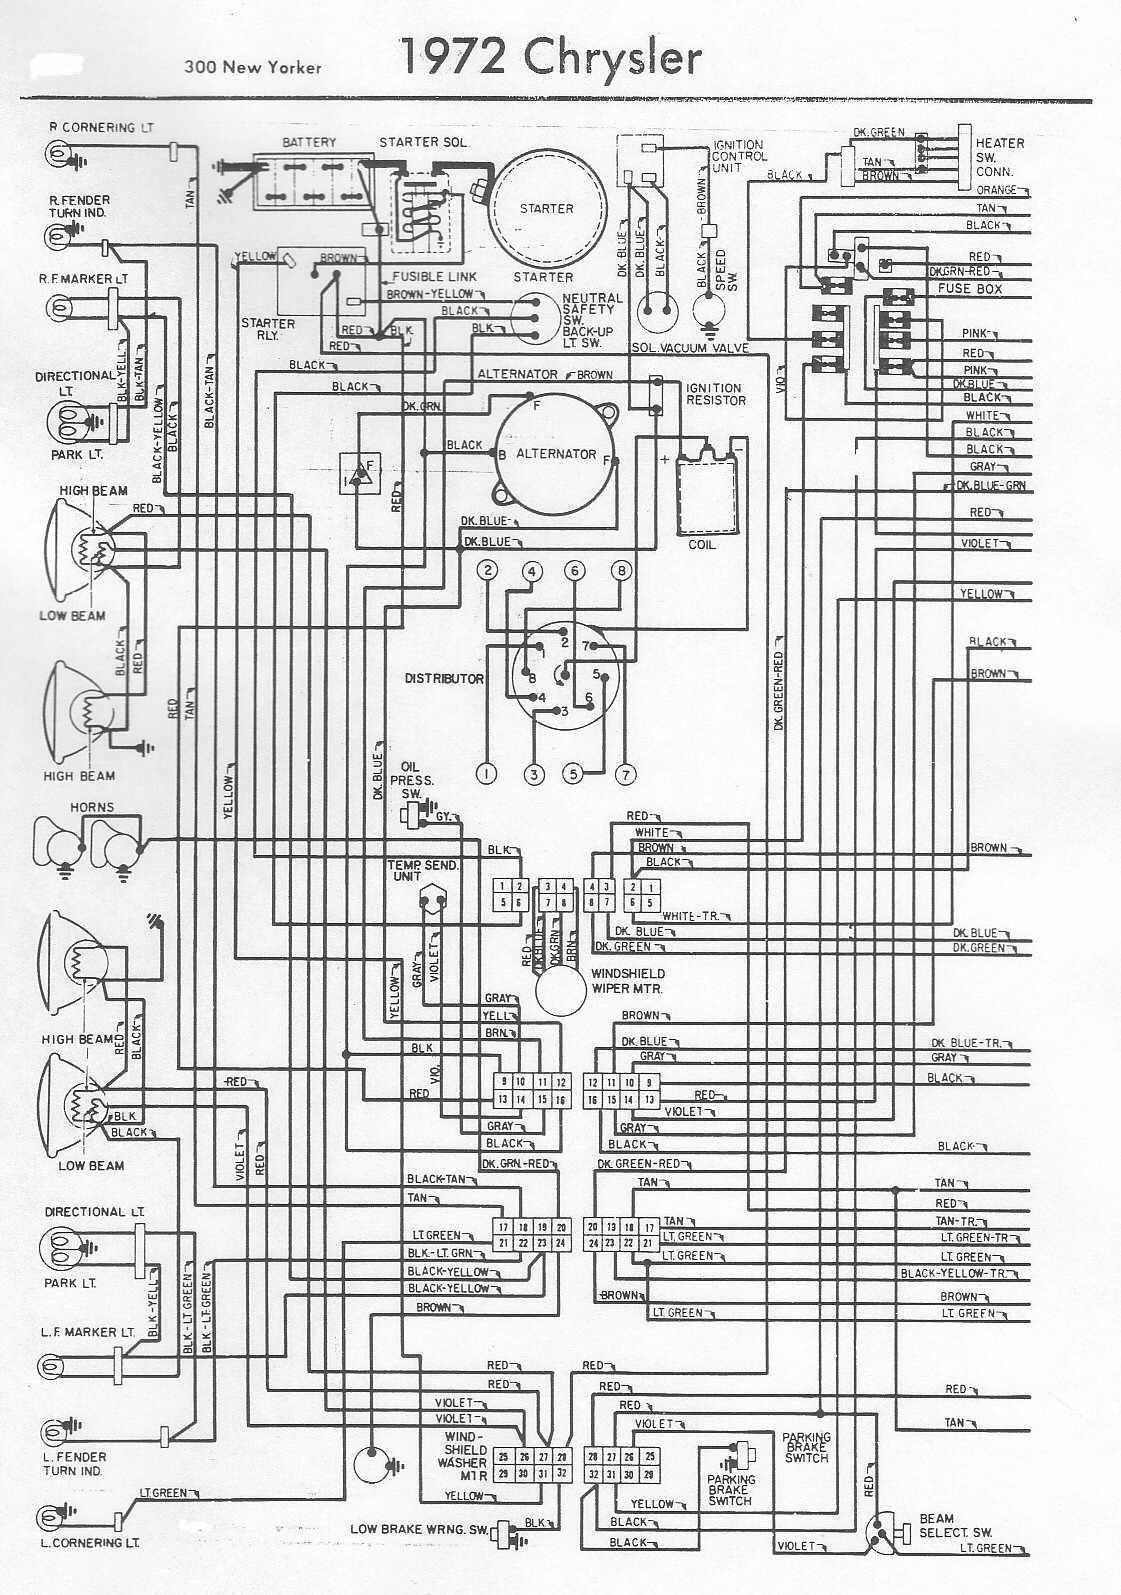 small resolution of 1968 chrysler wiring diagram wiring diagram third level 1966 chrysler 300 1966 chrysler new yorker wiring